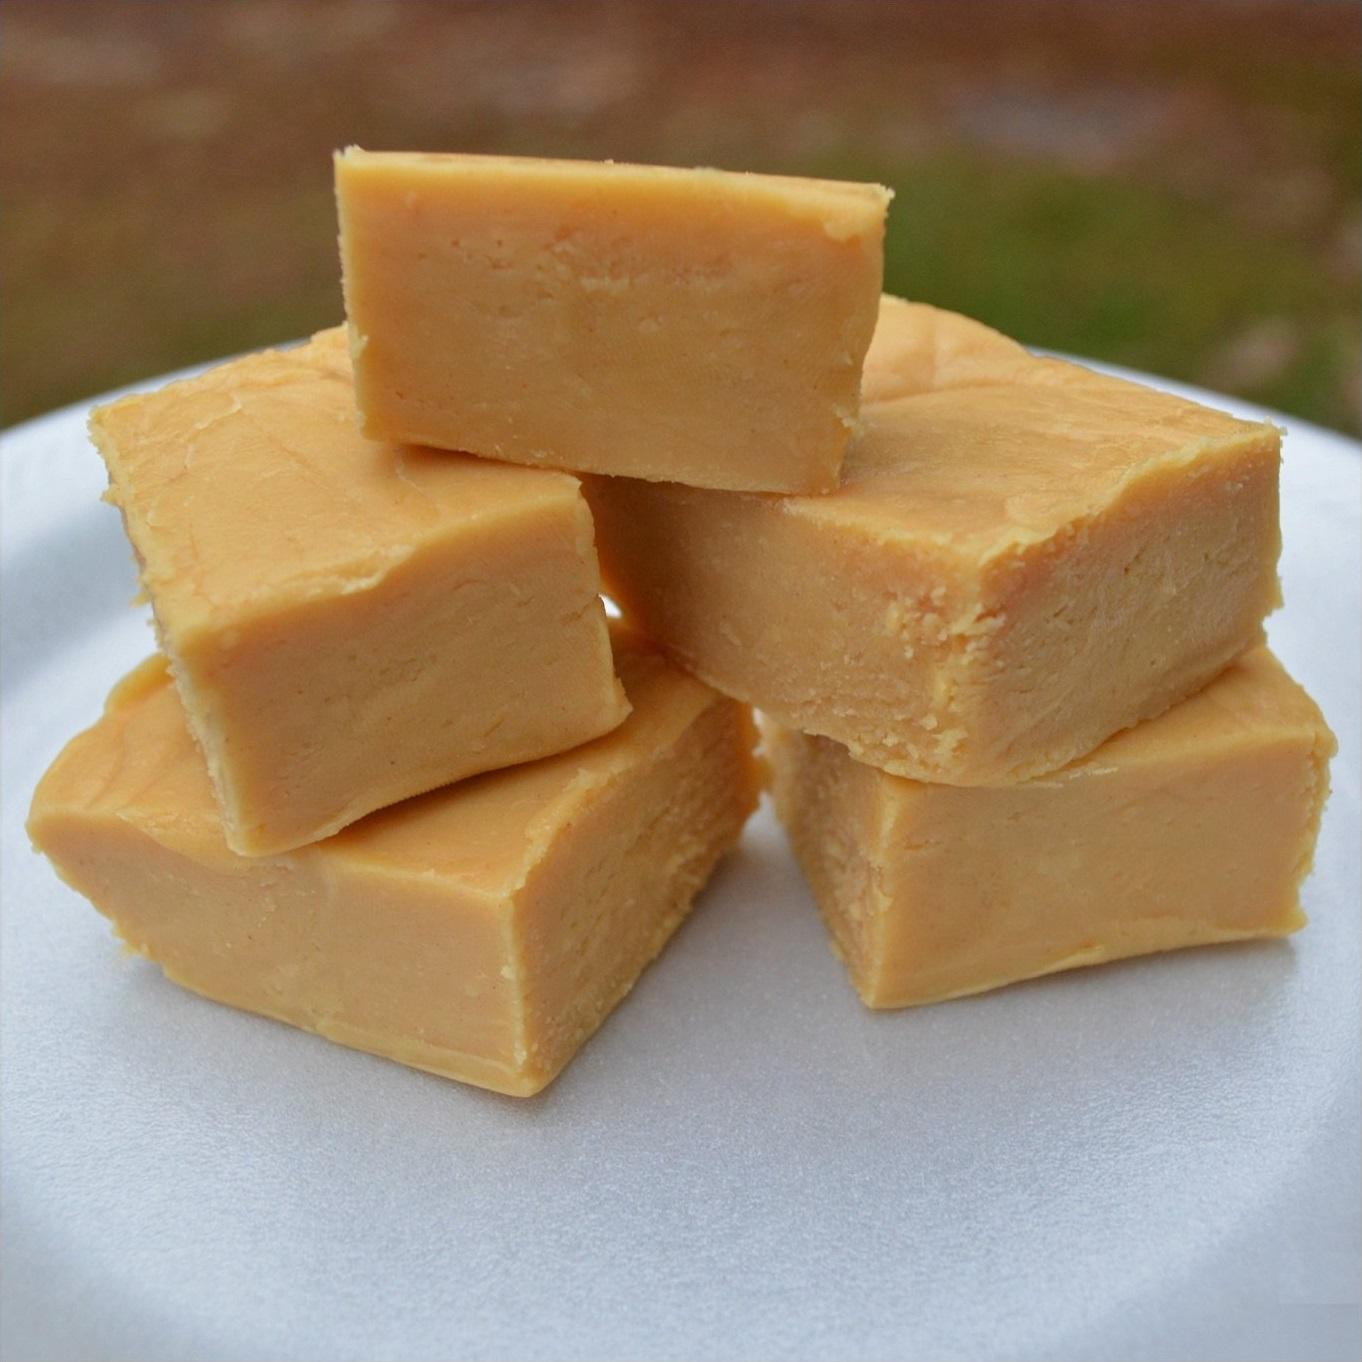 EAGLE BRAND® Peanut Butter Fudge